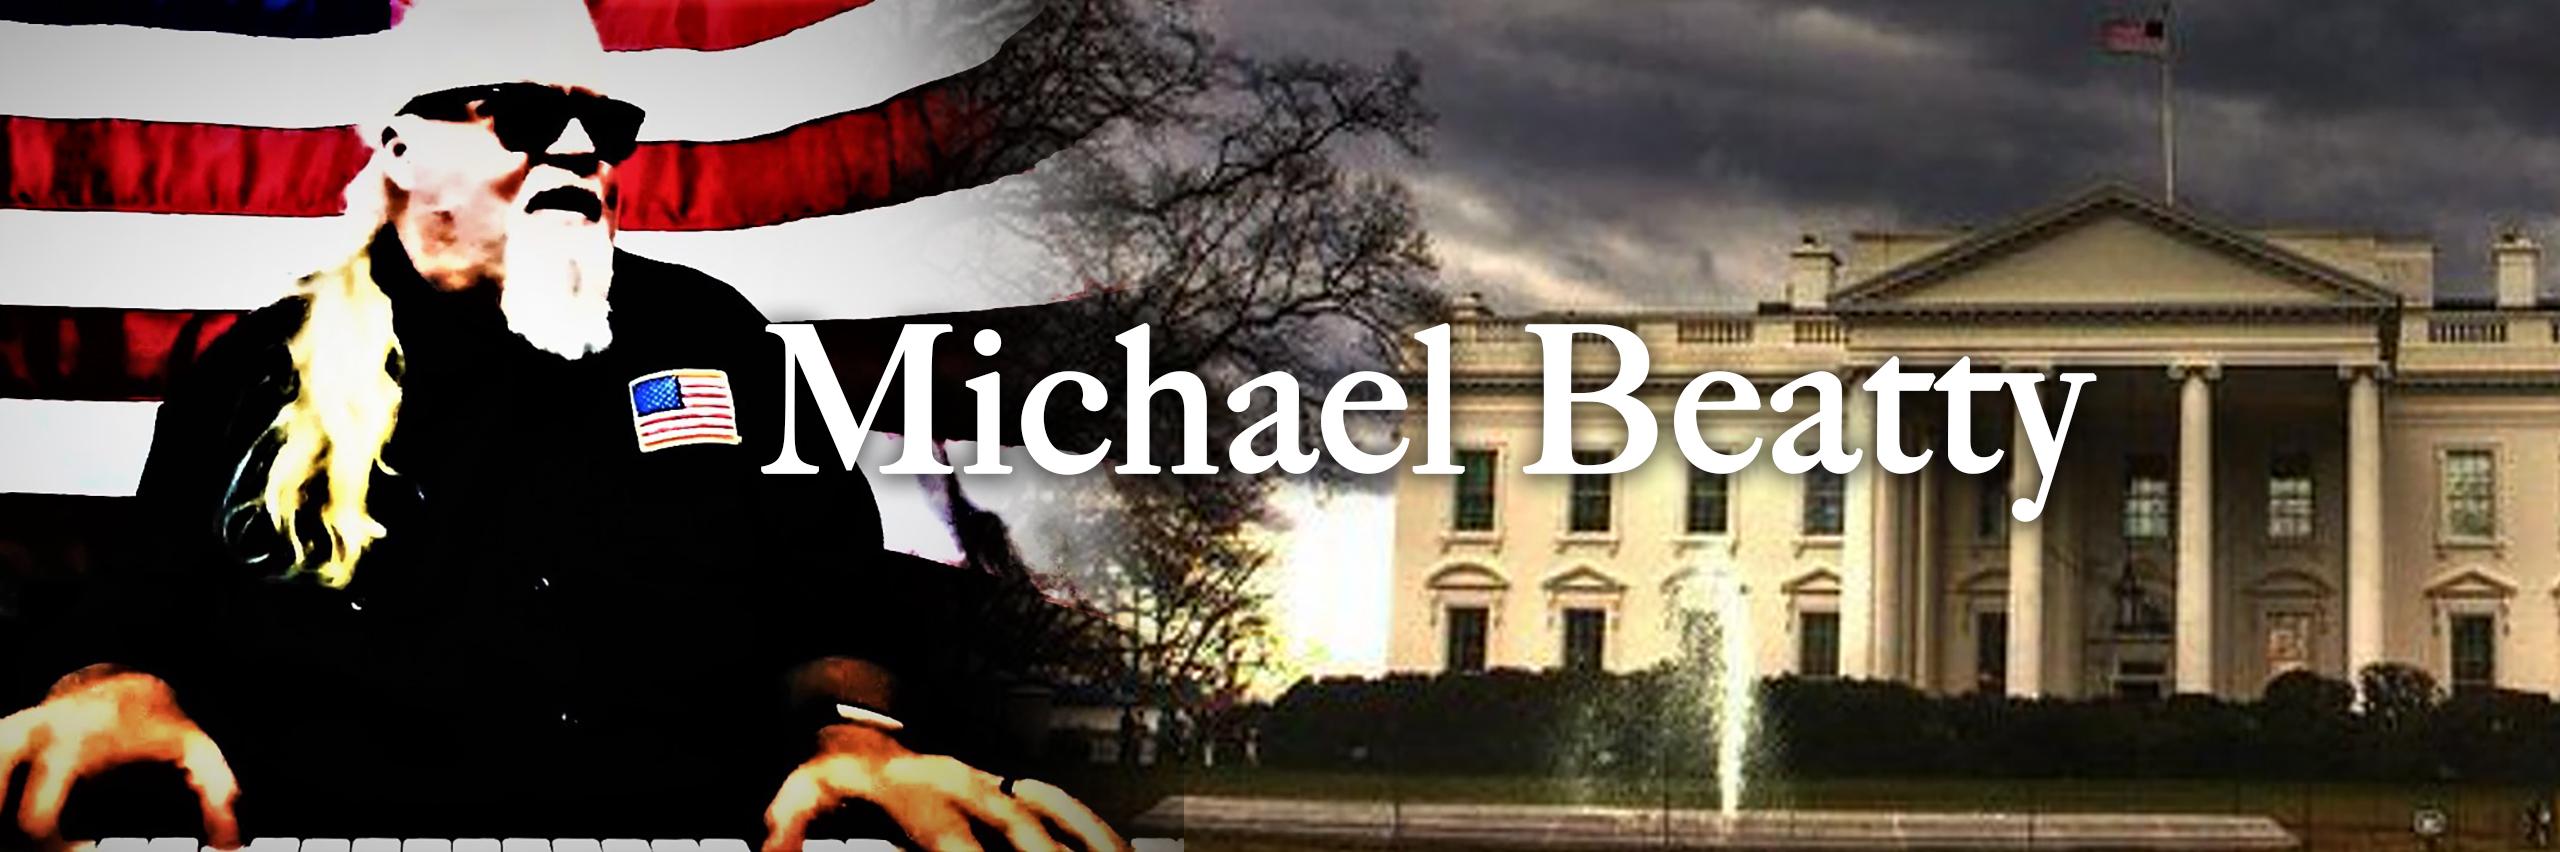 MichaelBeatty_header2-1